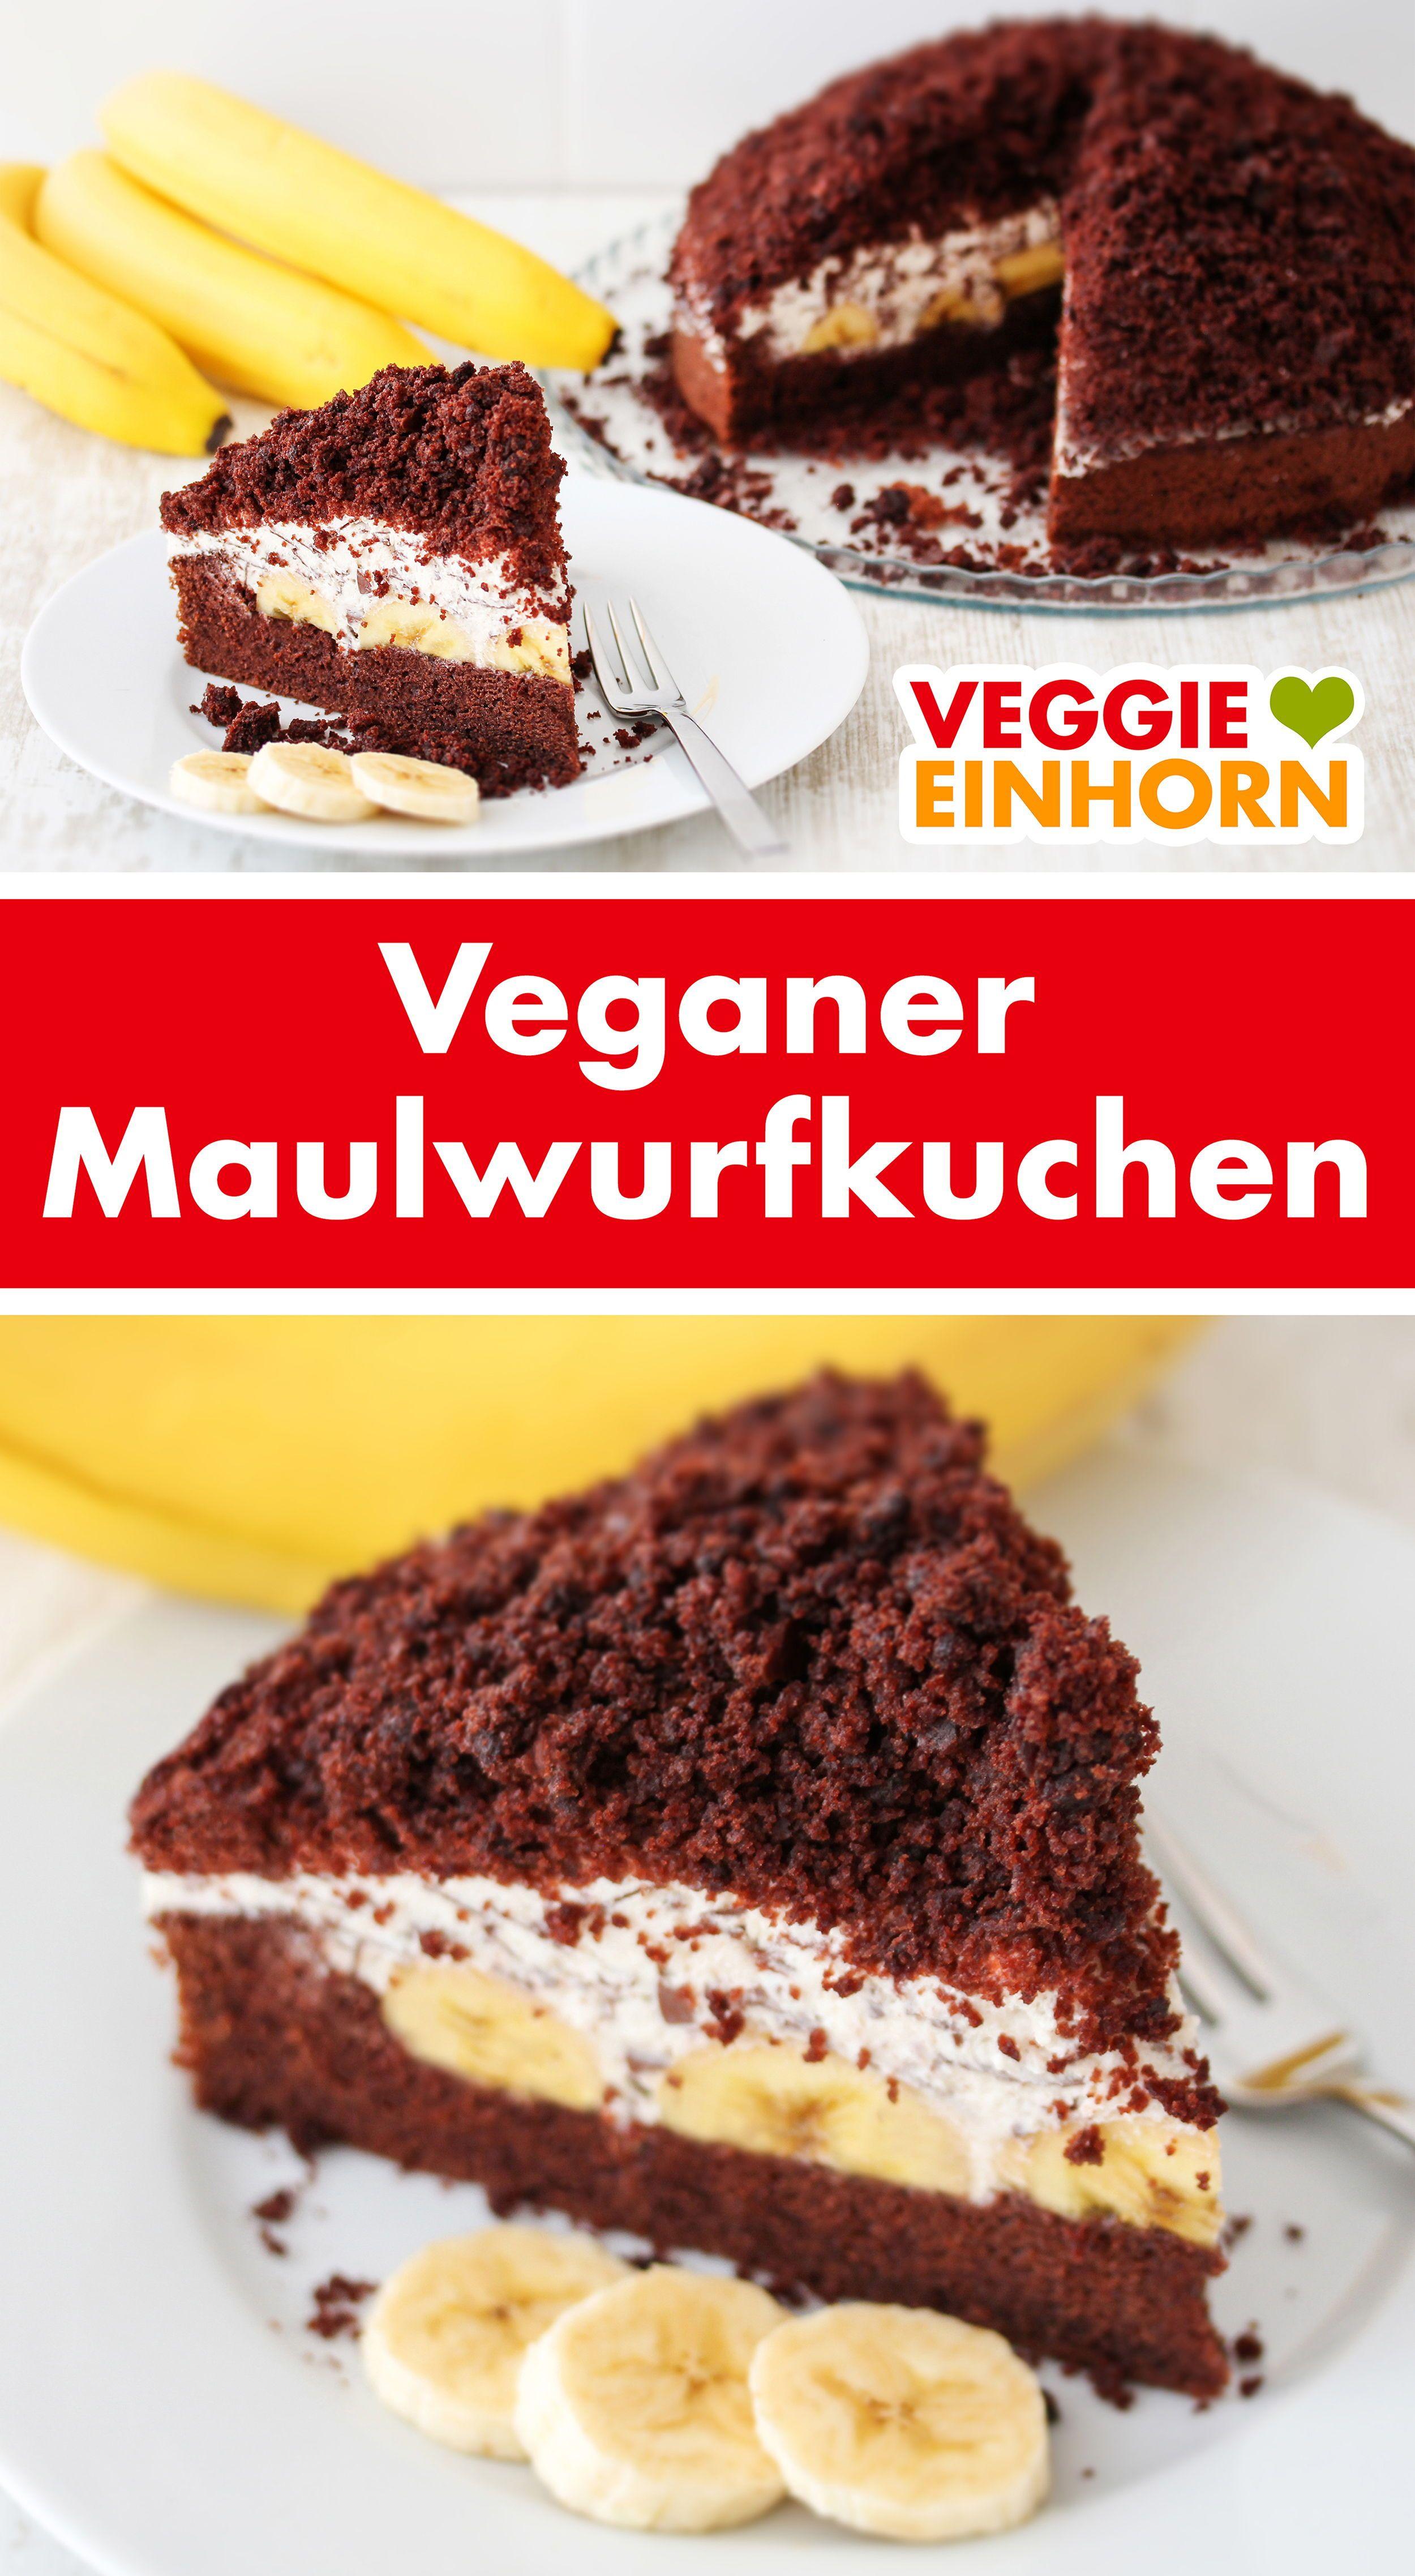 Veganer Maulwurfkuchen Veganer Kuchen Einfaches Rezept Zum Backen Veganer Kuchen Vegane Kuchenrezepte Maulwurfkuchen